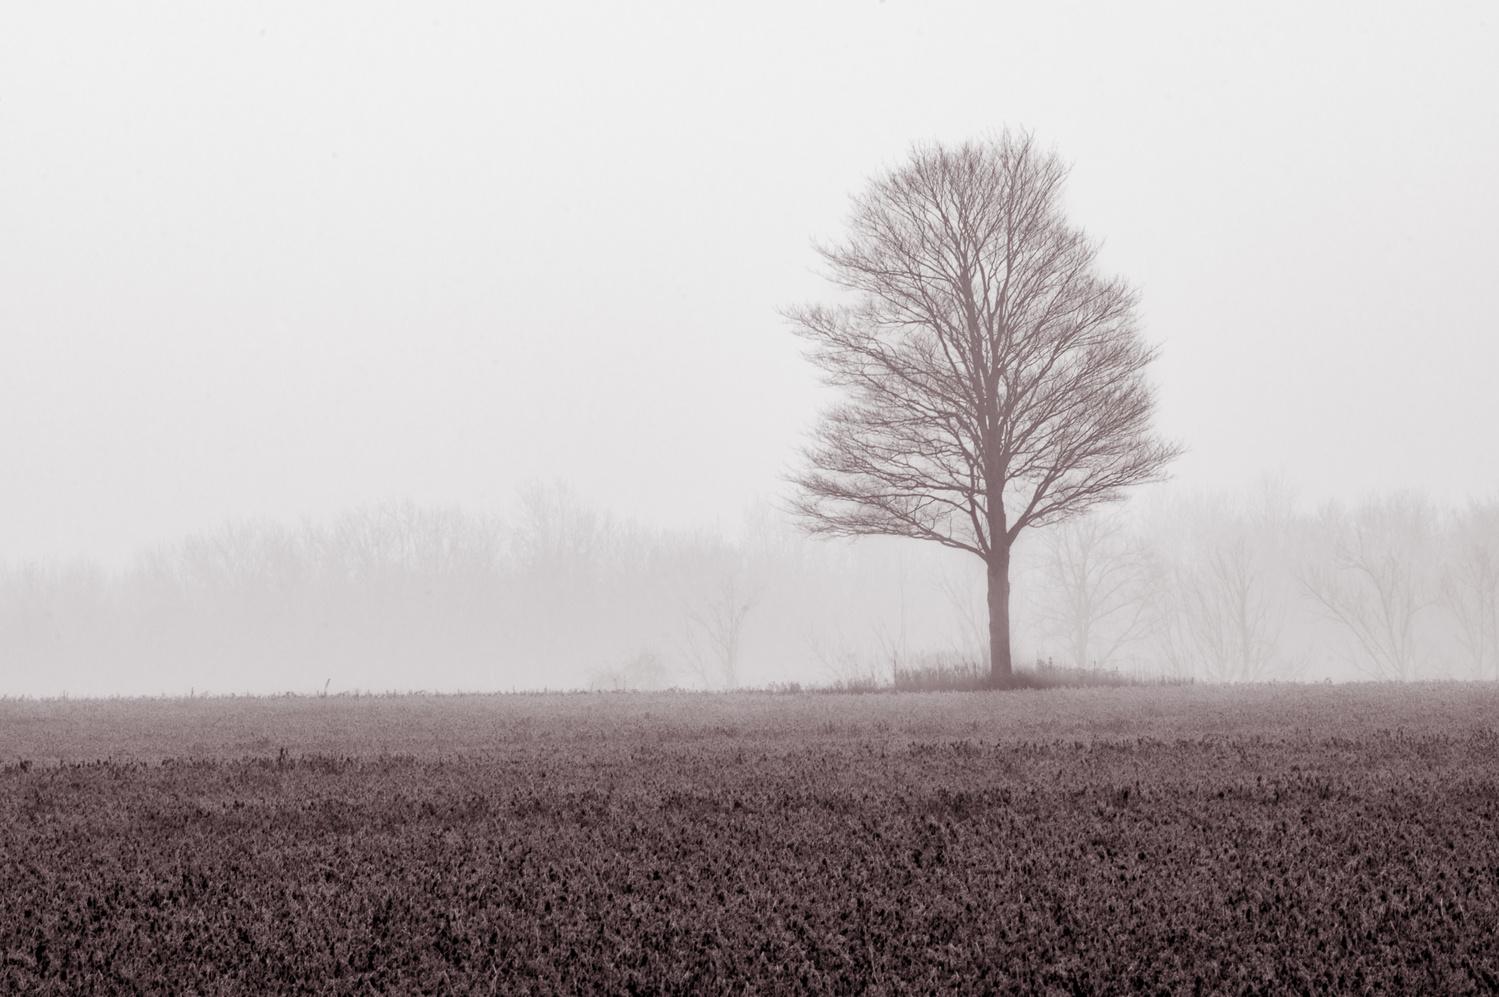 Tree in fog by Jason Orr